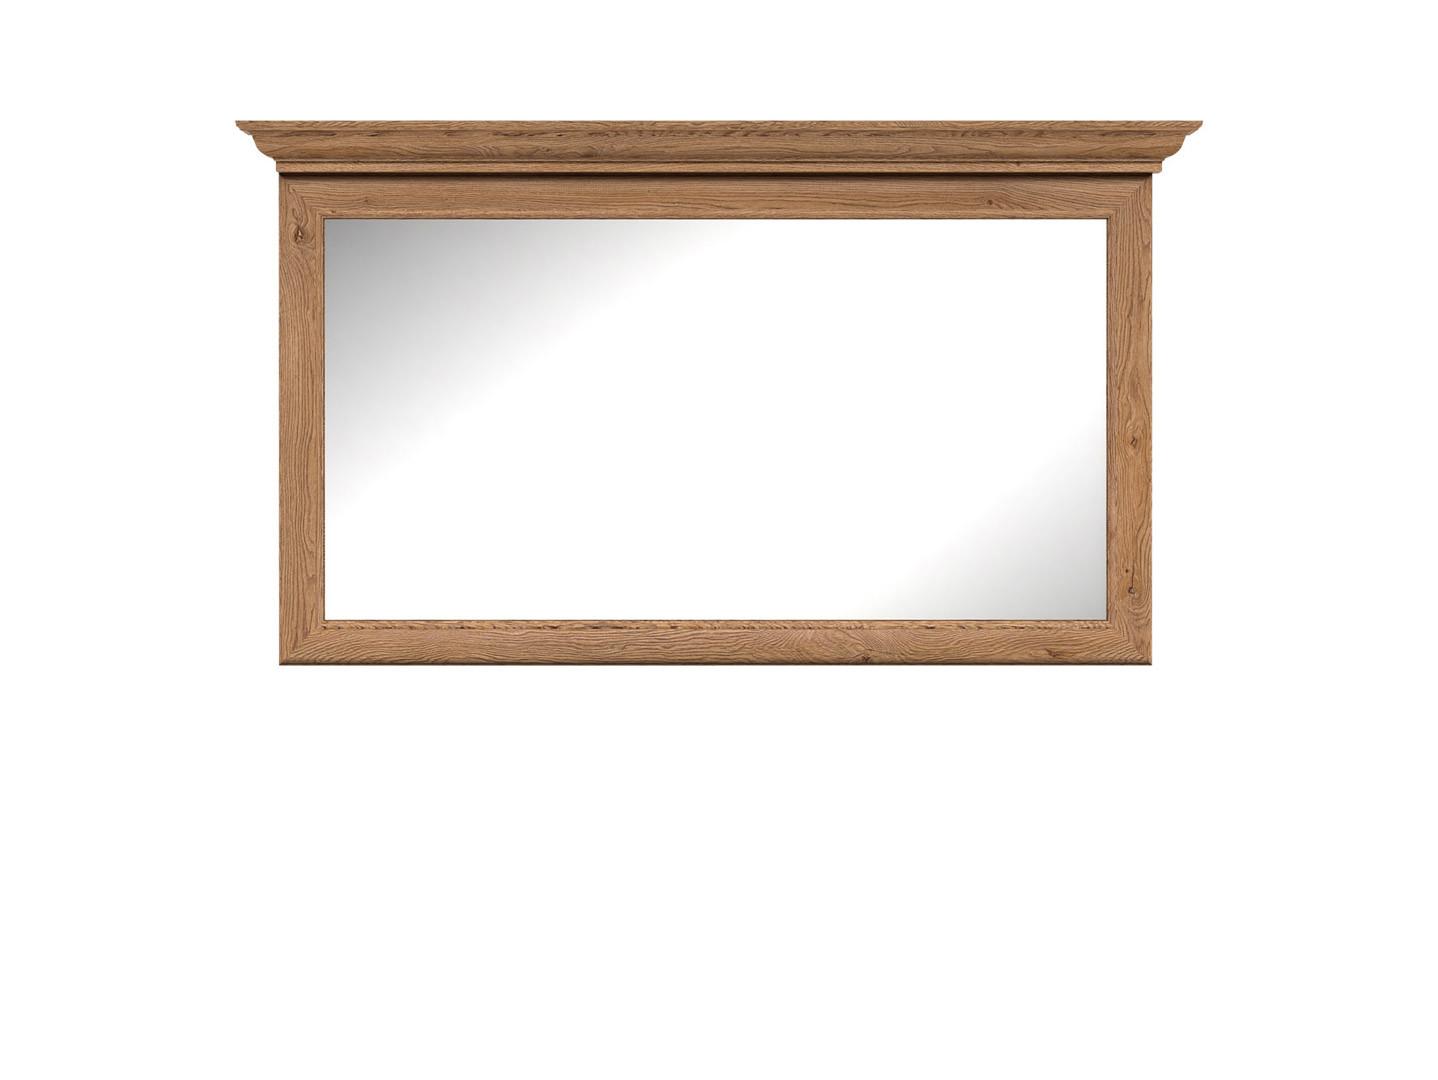 Zrkadlo KENT ELUS 155 dub amsterdam